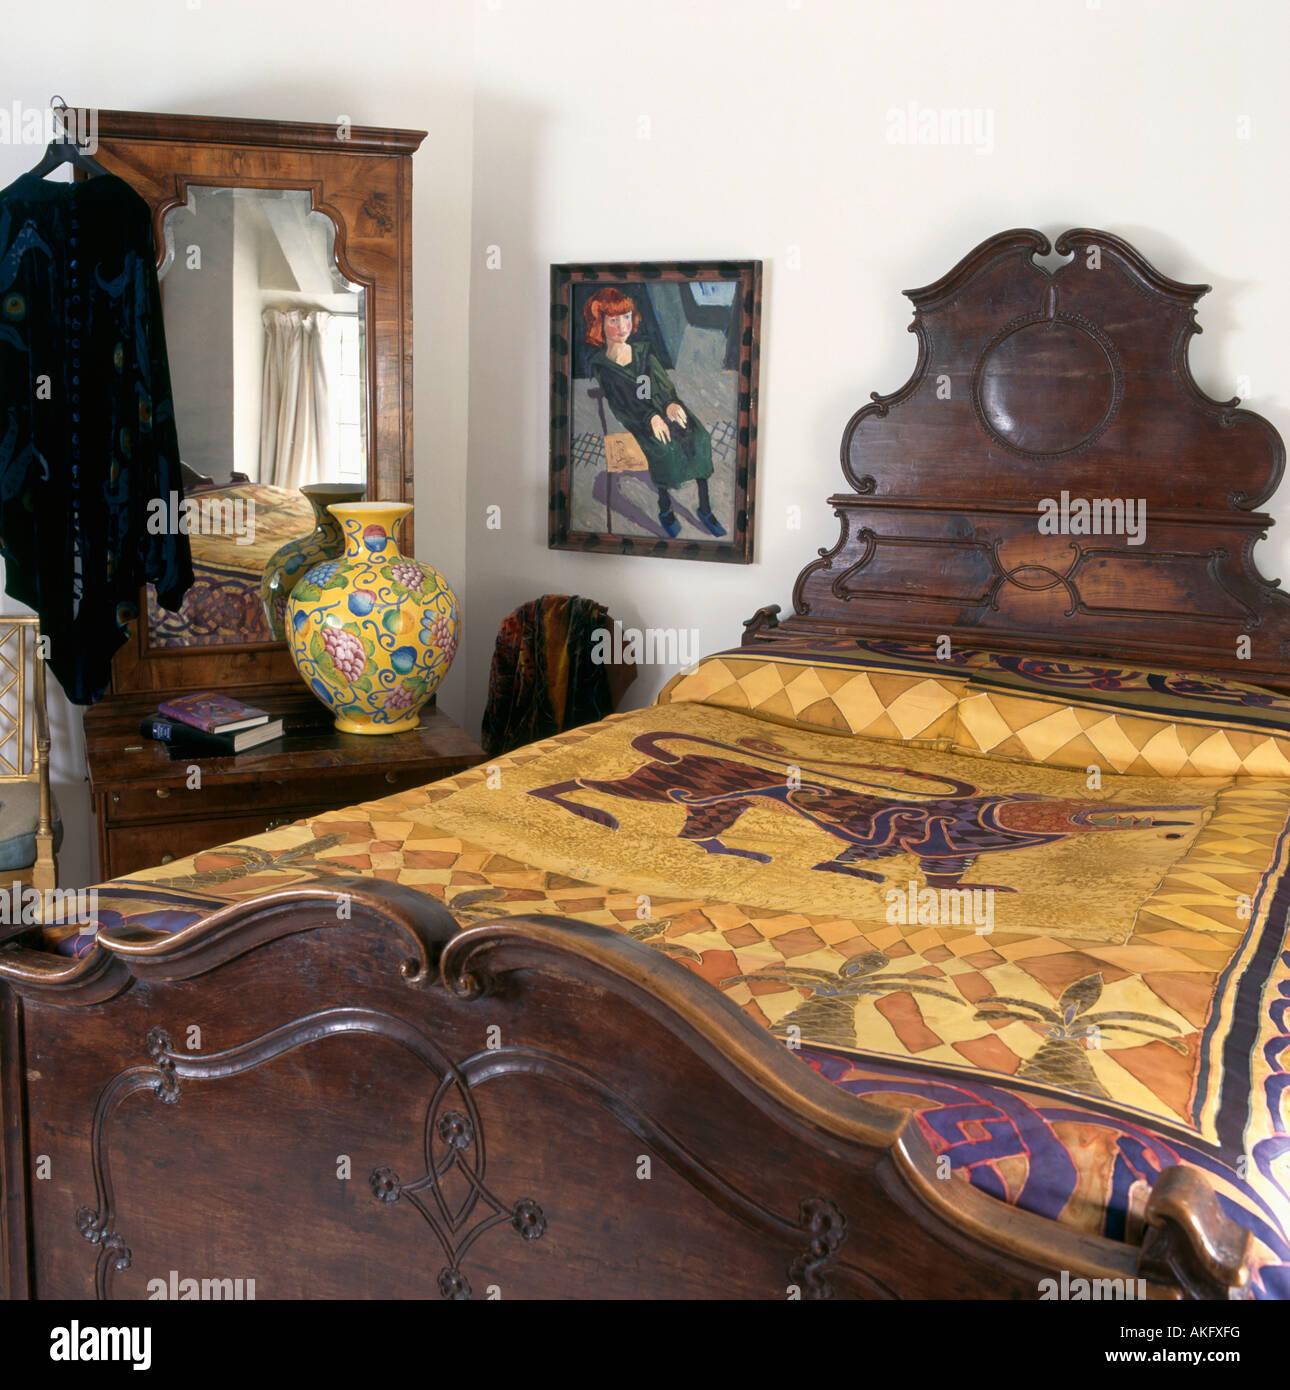 Bedrooms linen silk immagini bedrooms linen silk fotos stock alamy - Parete testata letto dipinta ...